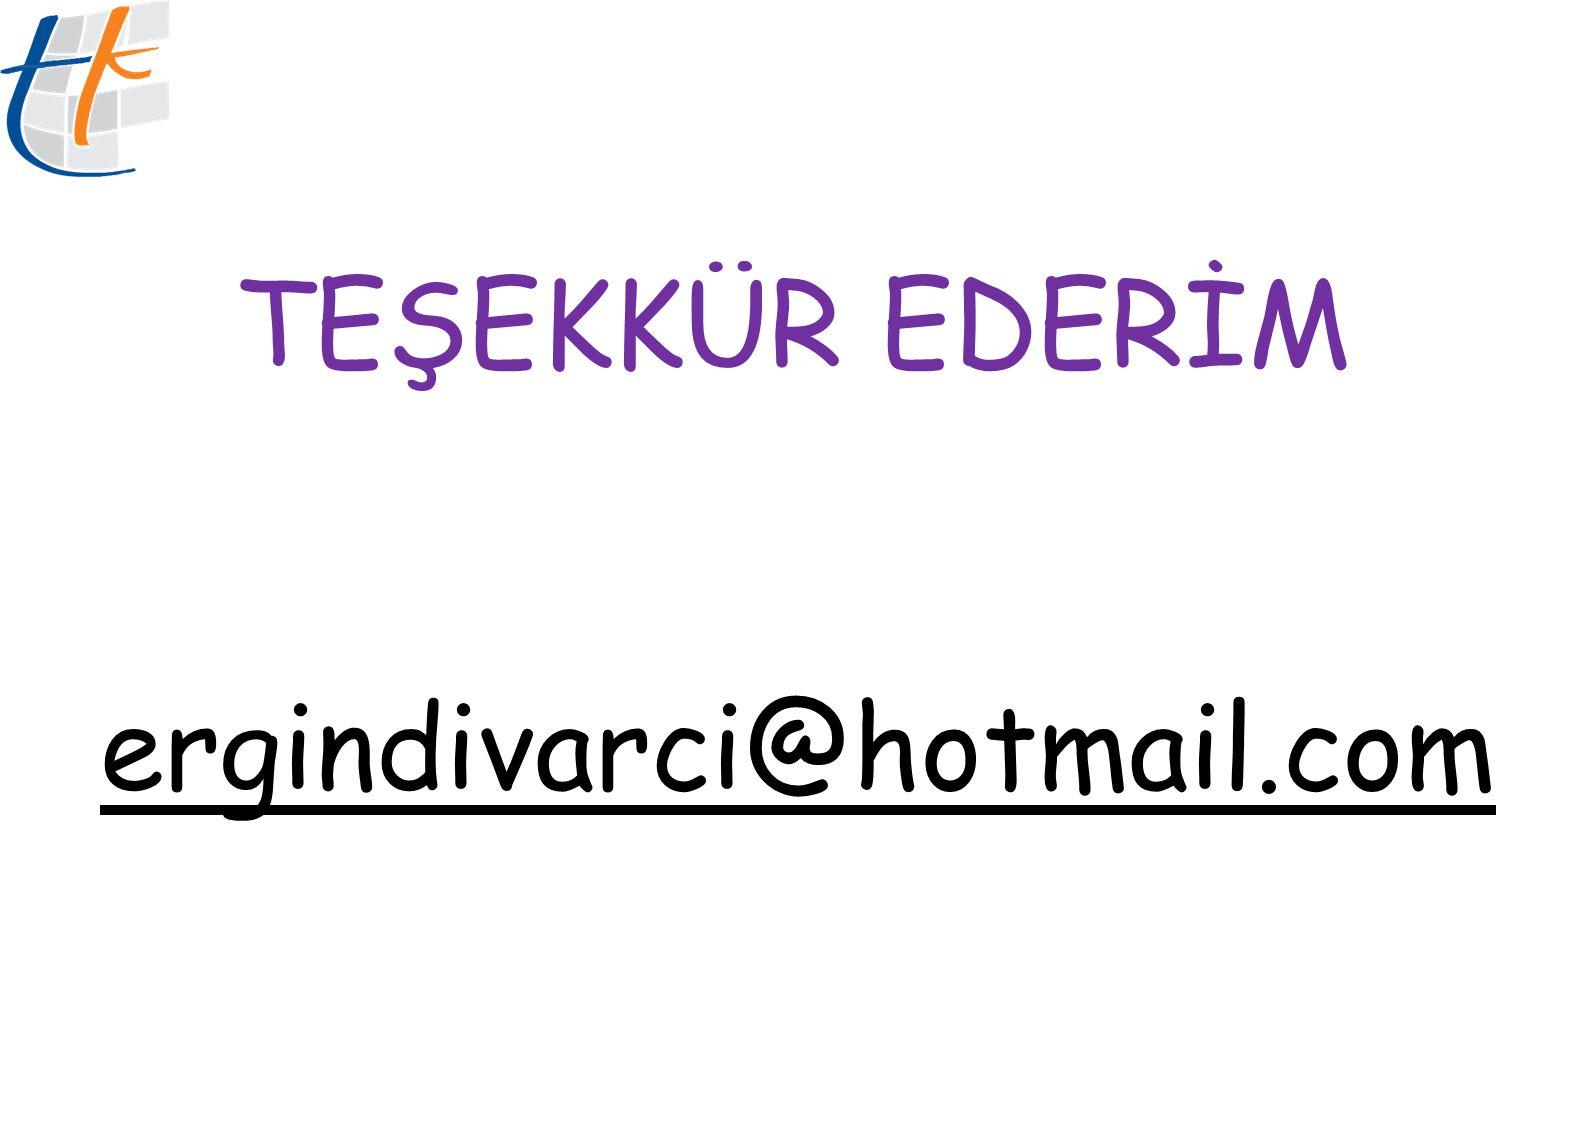 TEŞEKKÜR EDERİM ergindivarci@hotmail.com